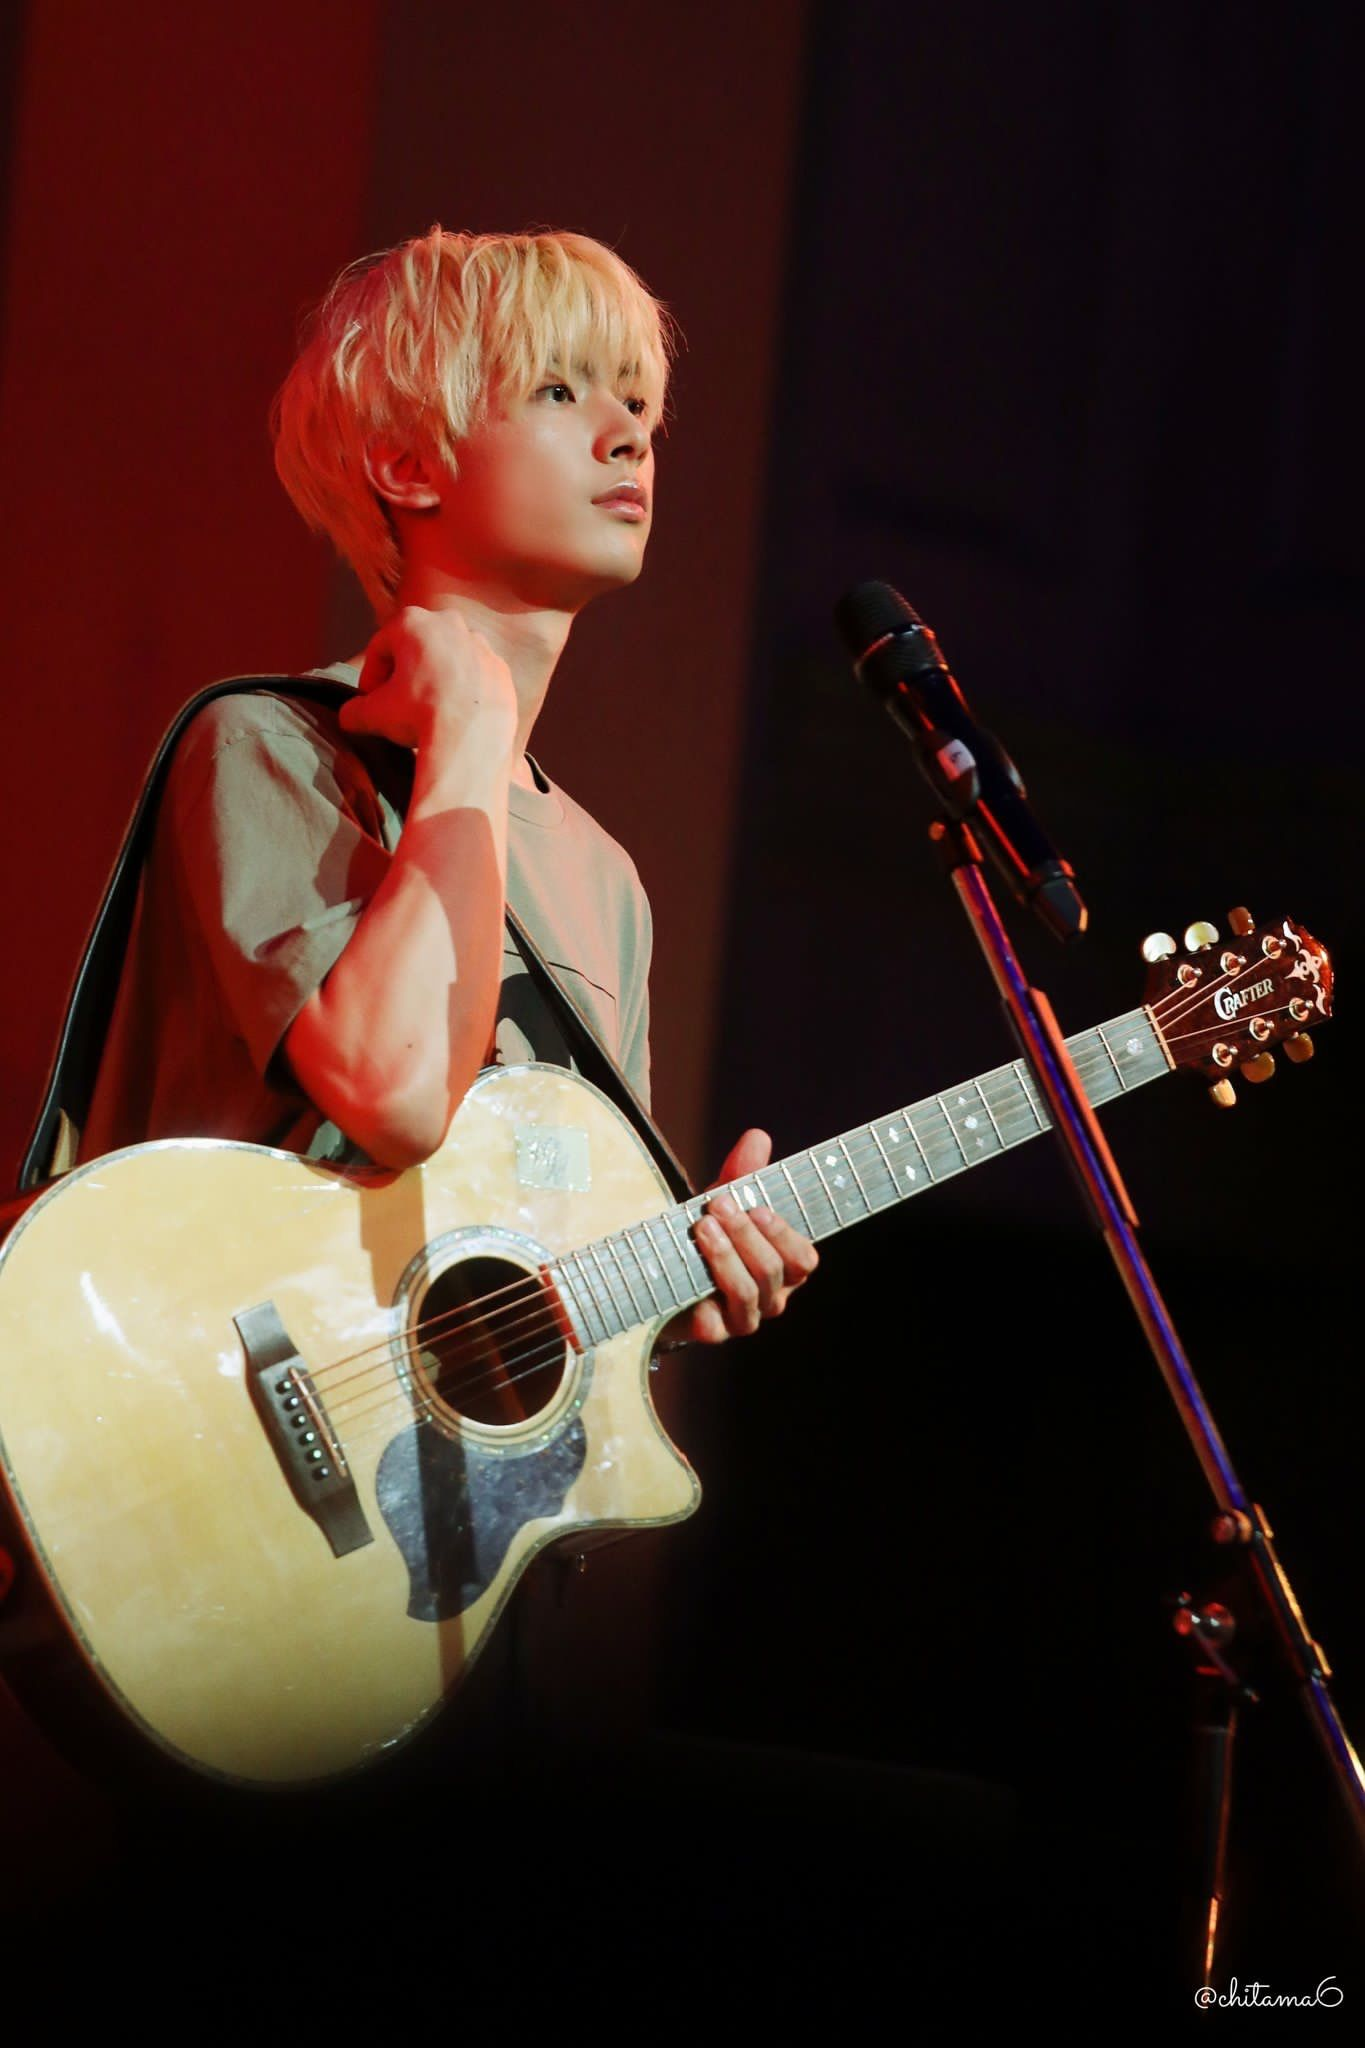 Kanghyun Music People Celebrities